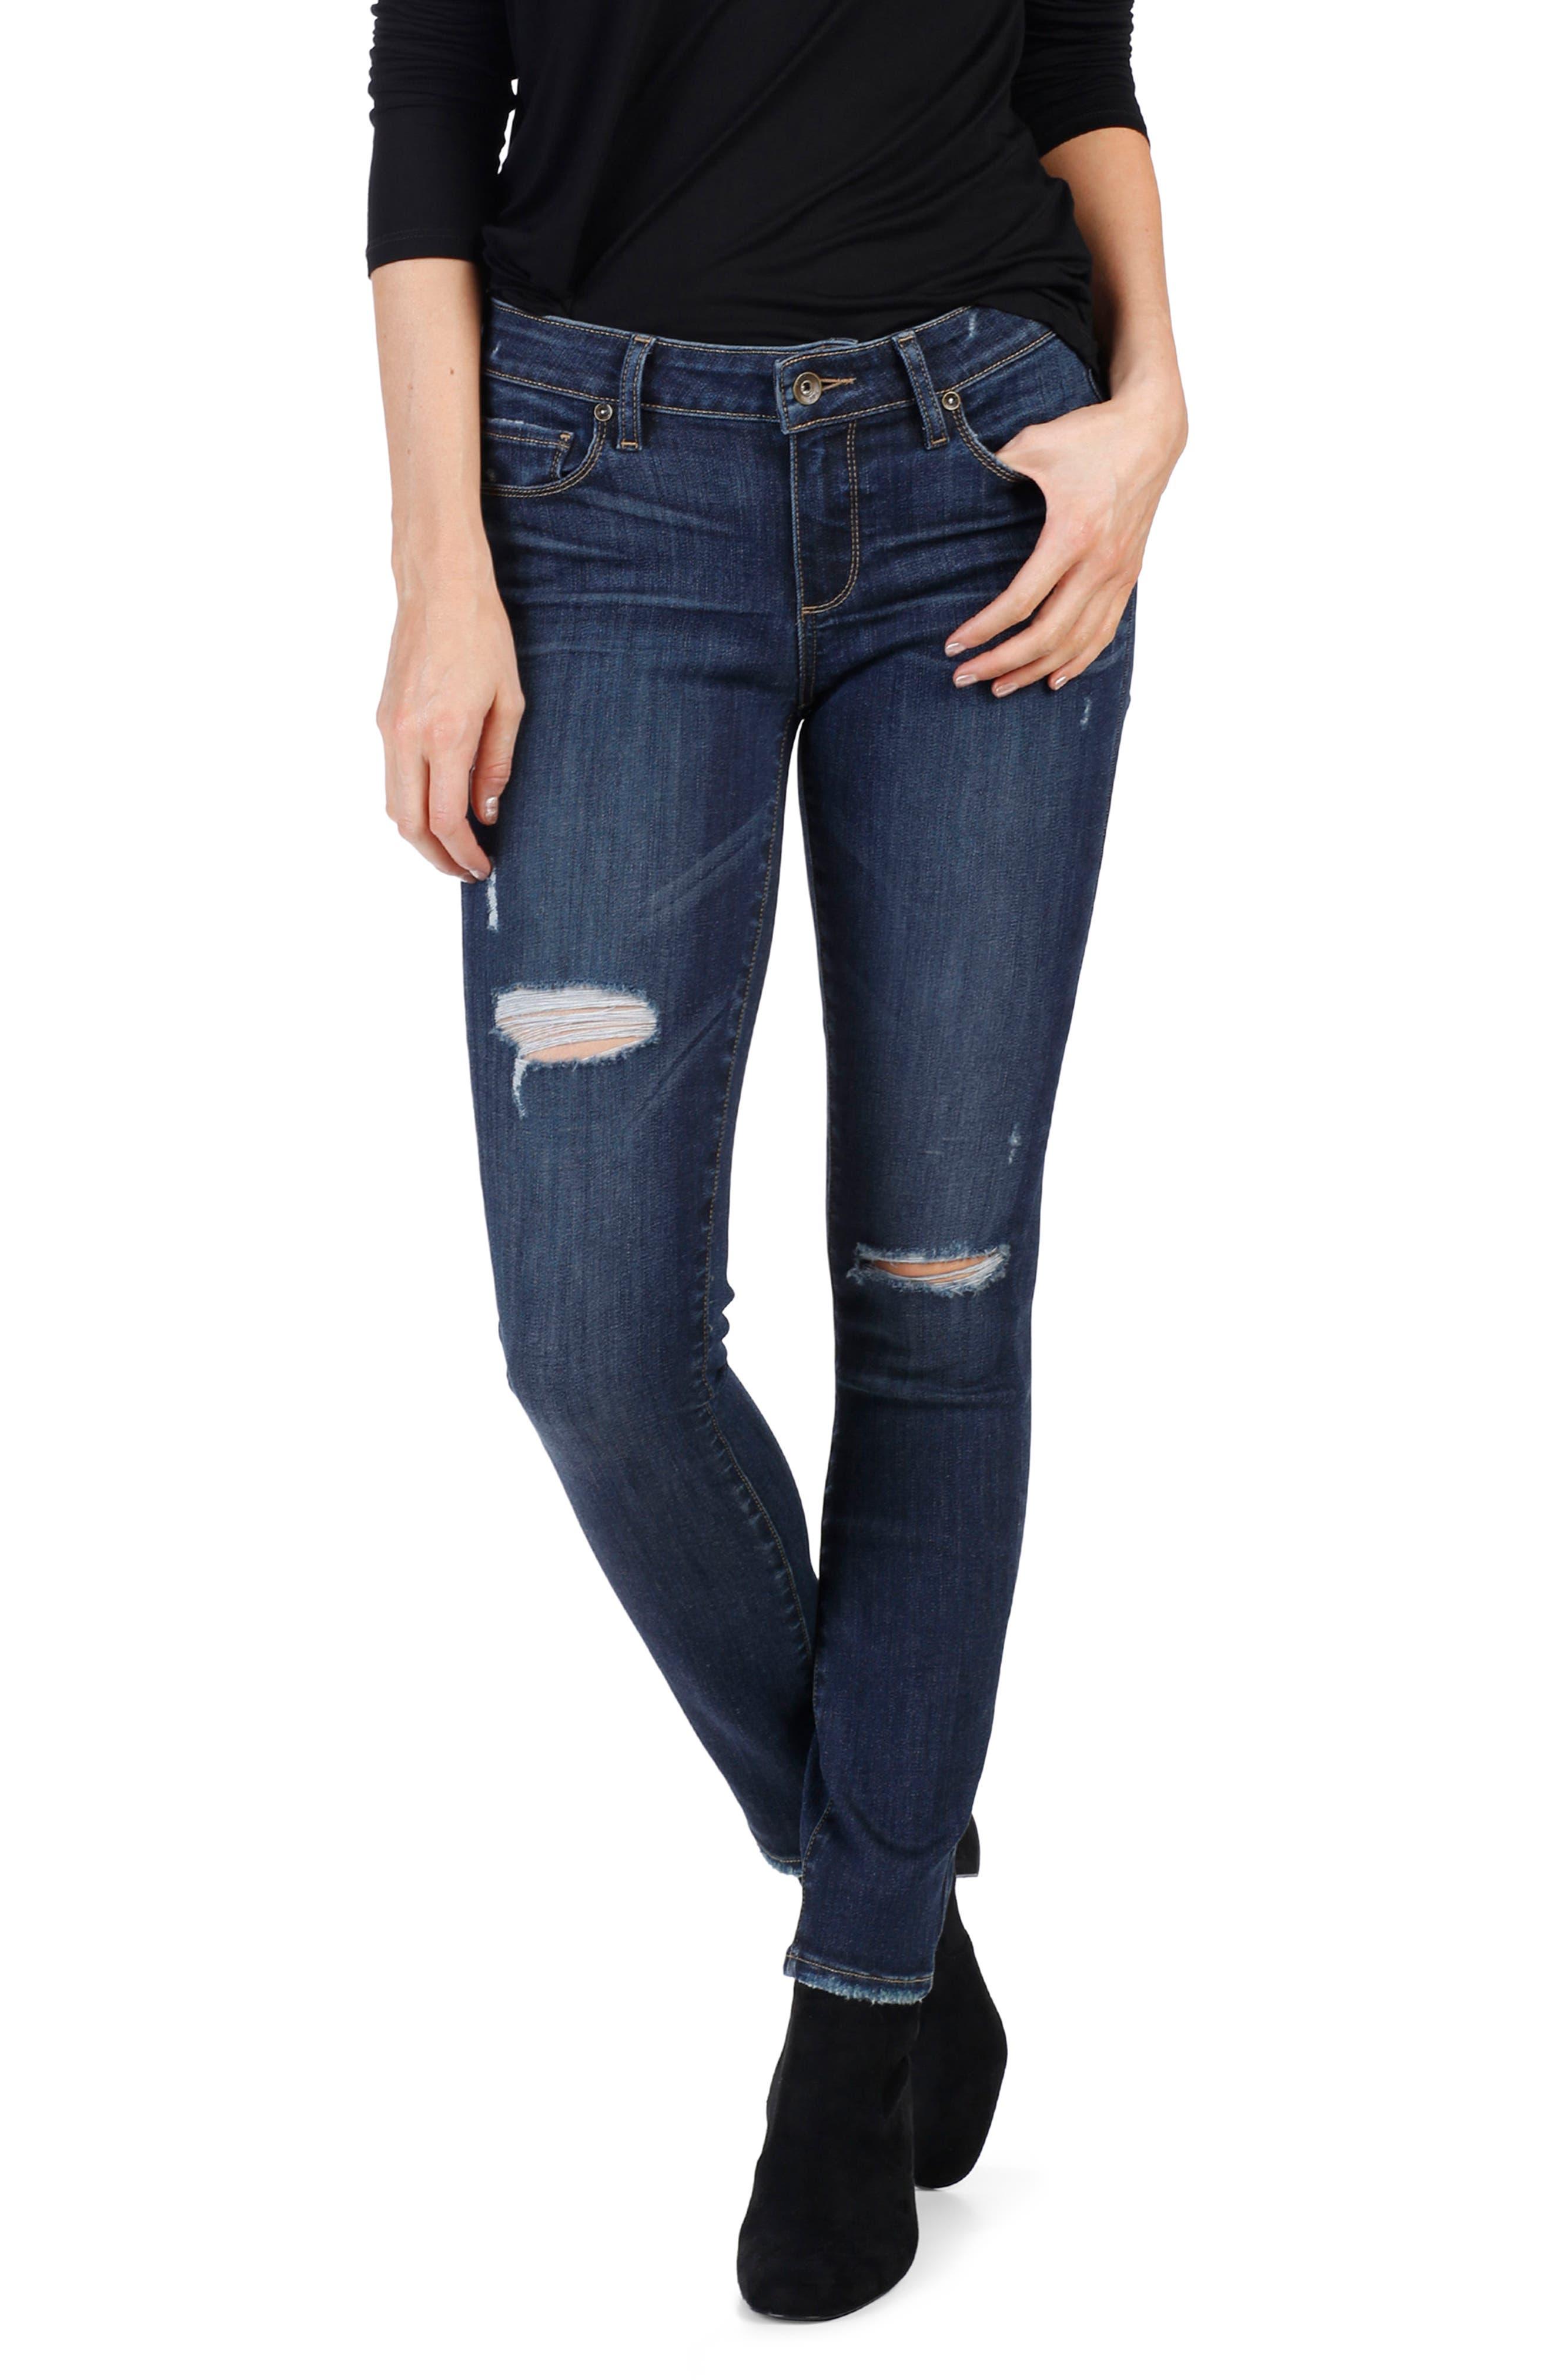 Alternate Image 1 Selected - PAIGE Transcend Vintage - Verdugo Ultra Skinny Jeans (Clearly Destructed)